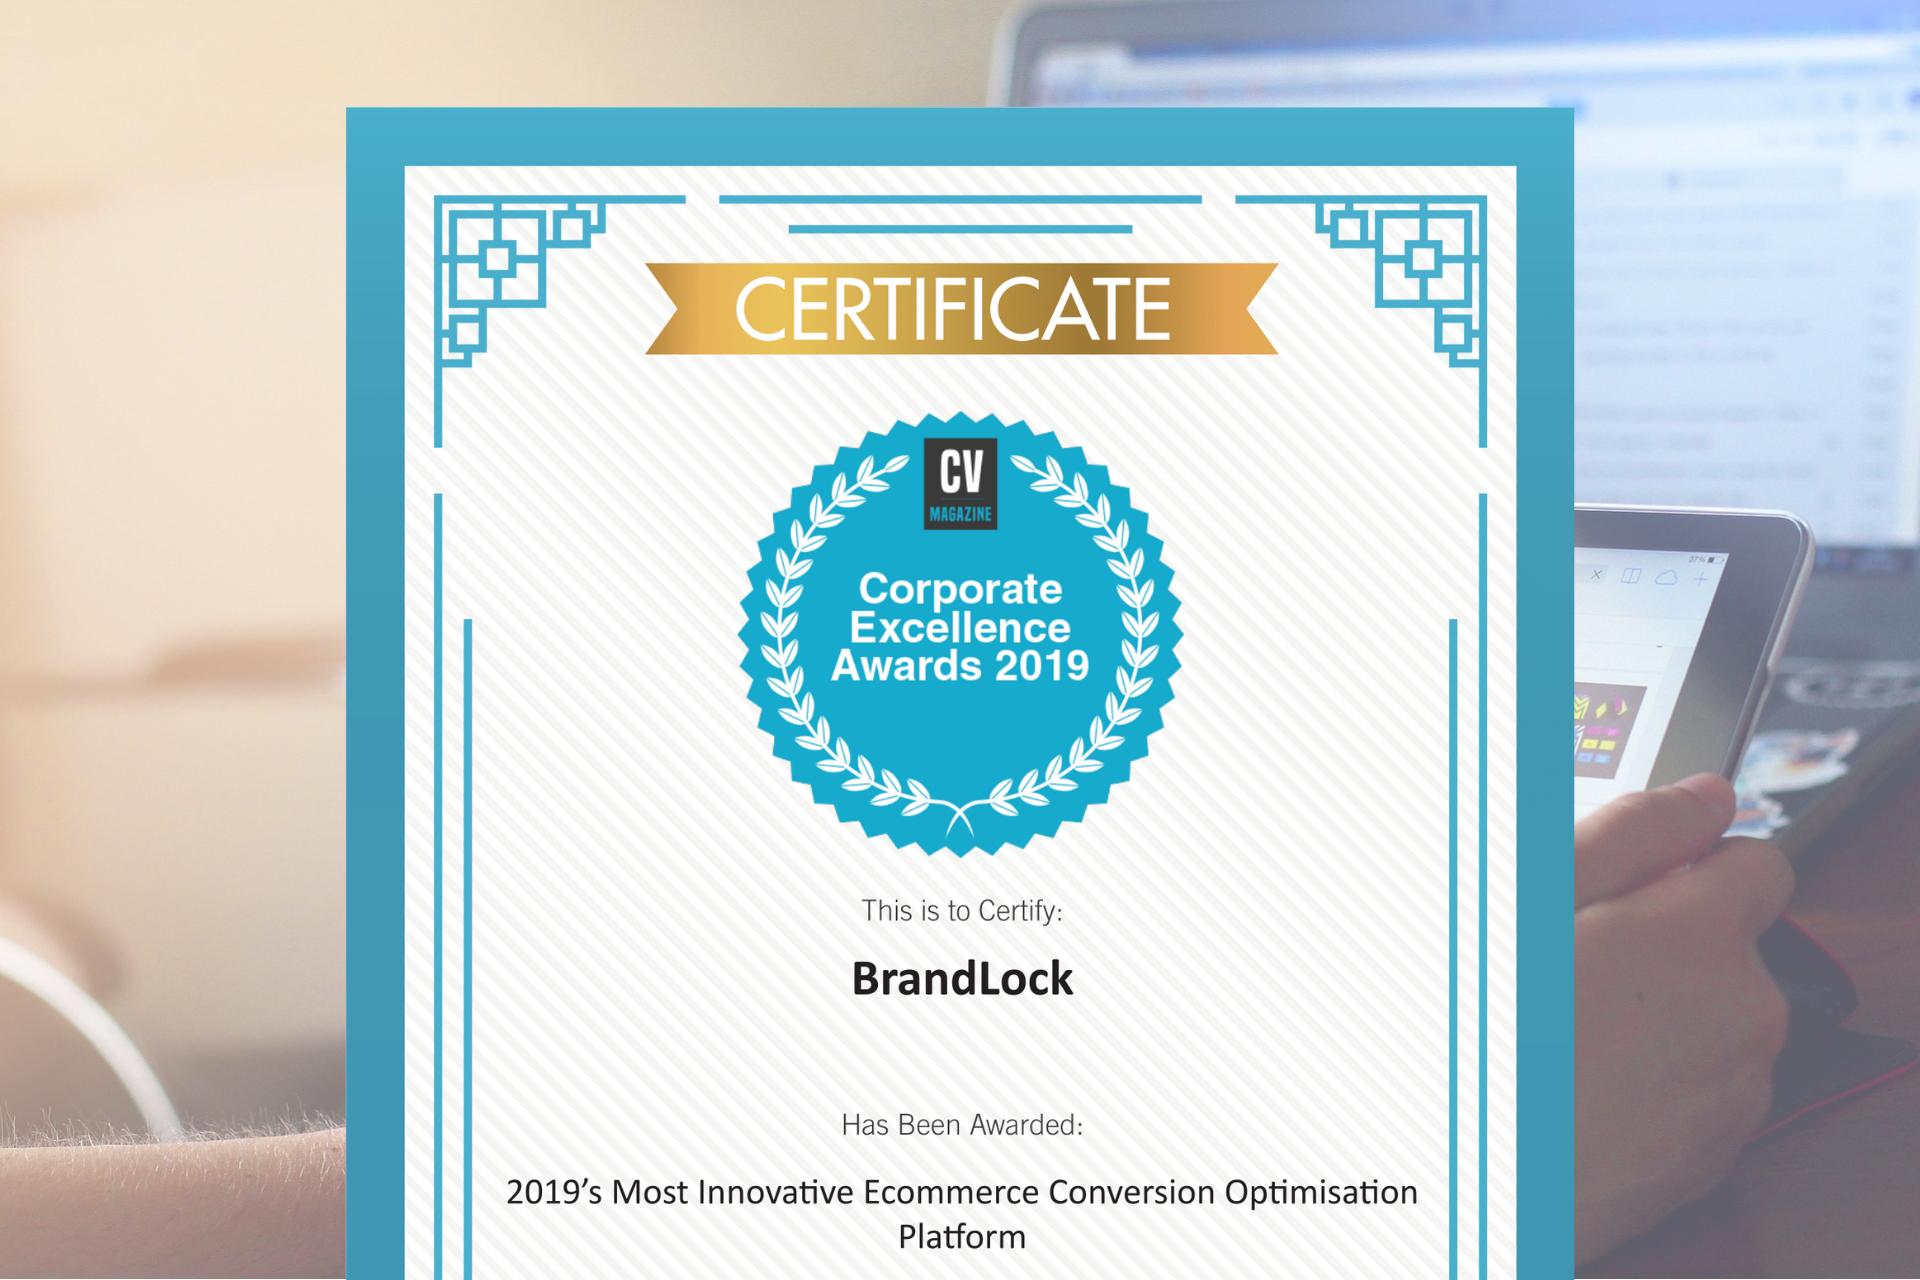 CV Magazine Names BrandLock 2019's Most Innovative Ecommerce Conversion Optimisation Platform